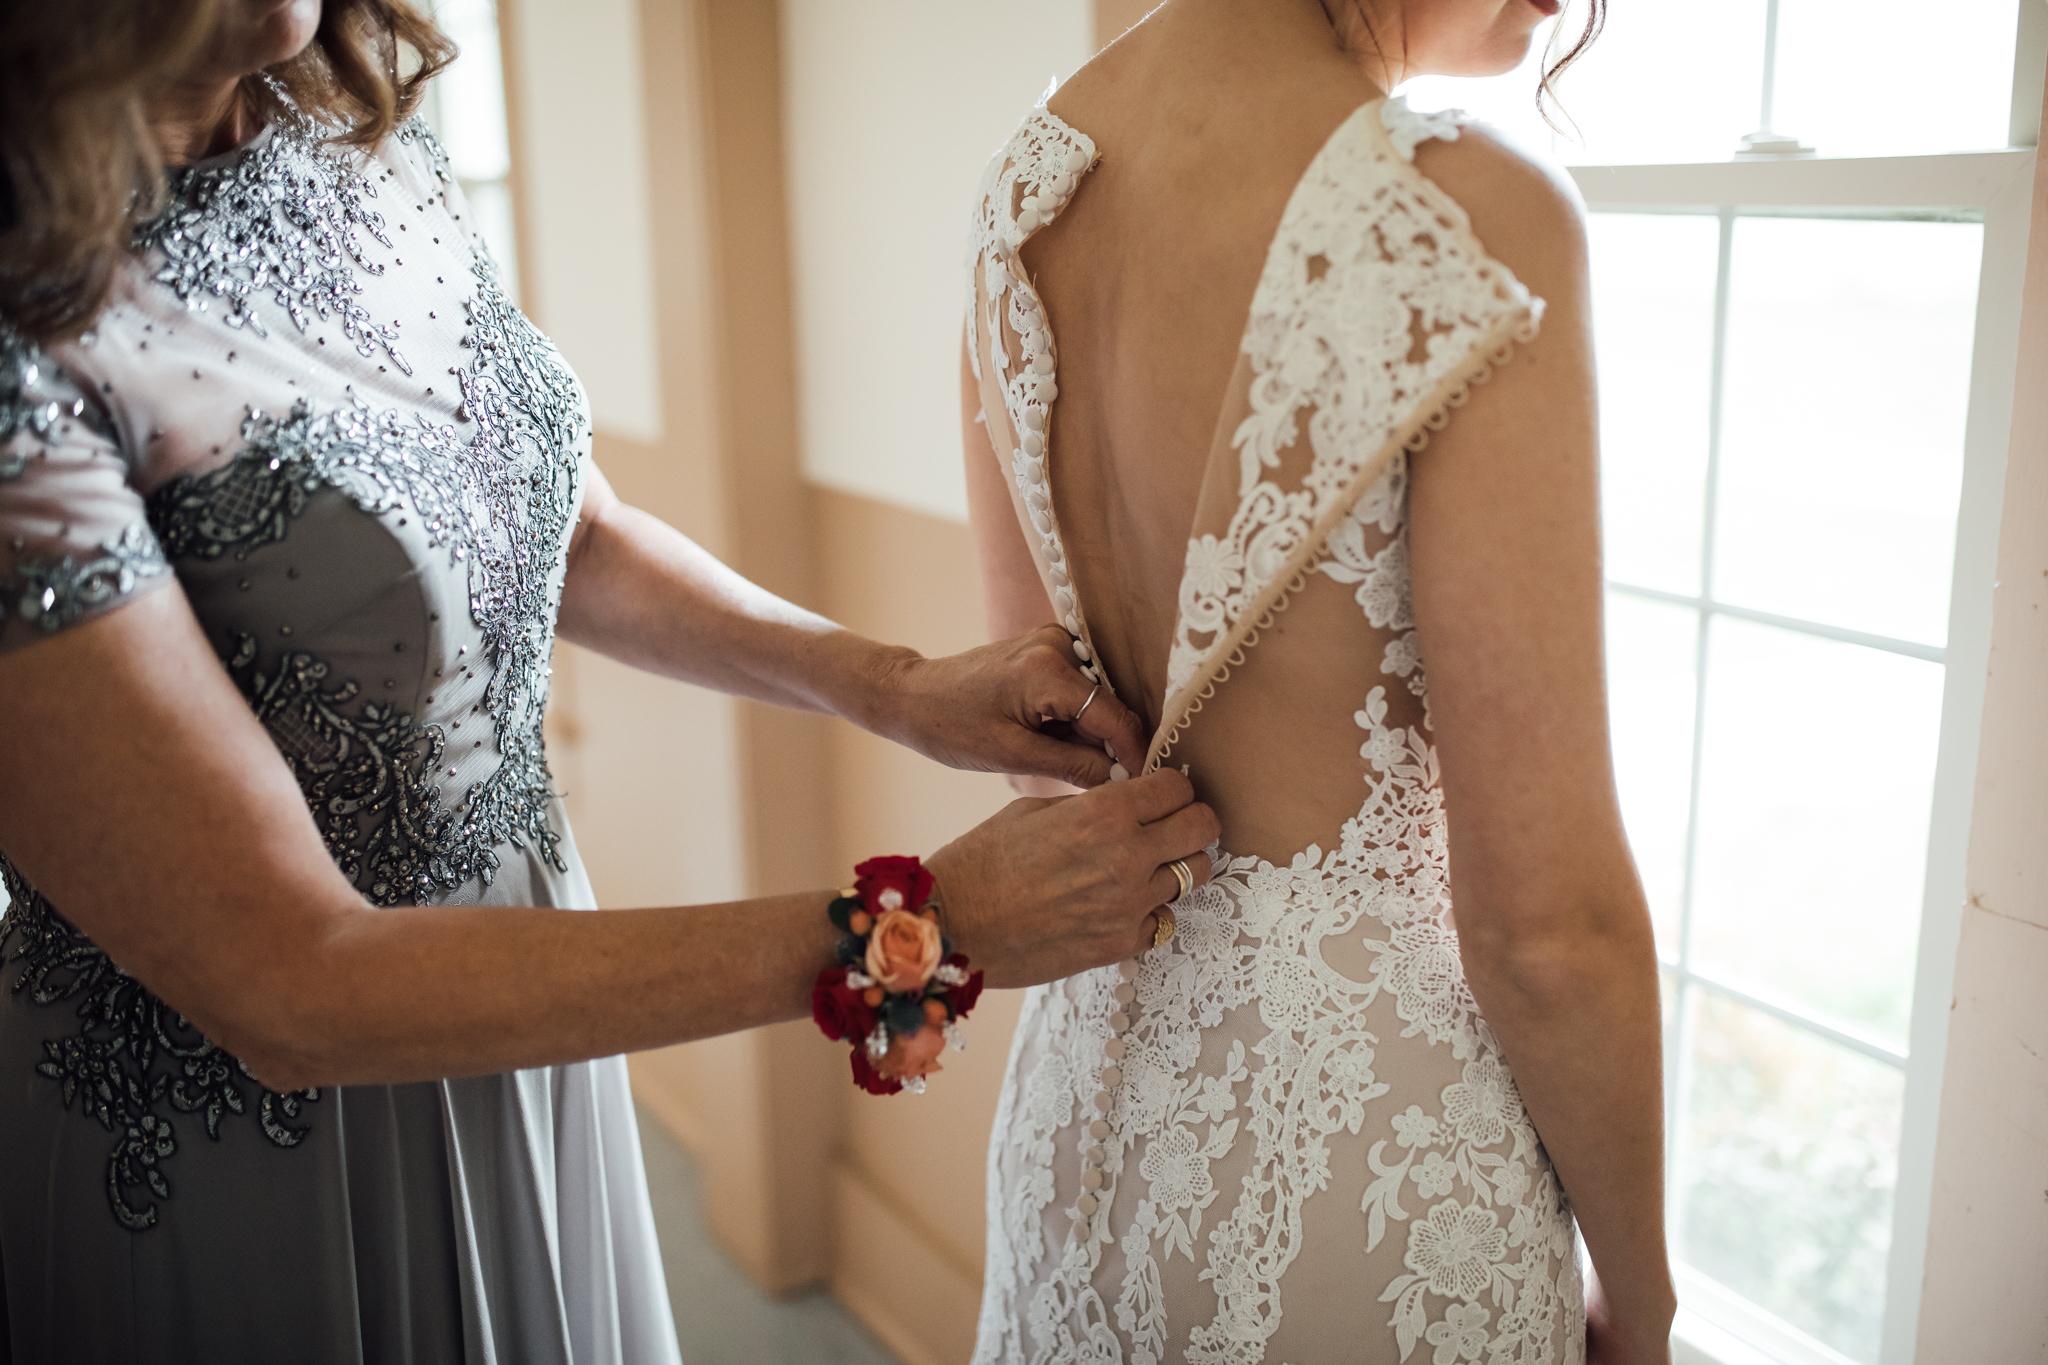 birmingham-alabama-wedding-photographer-laura-terry-the-warmth-around-you (24 of 110).jpg